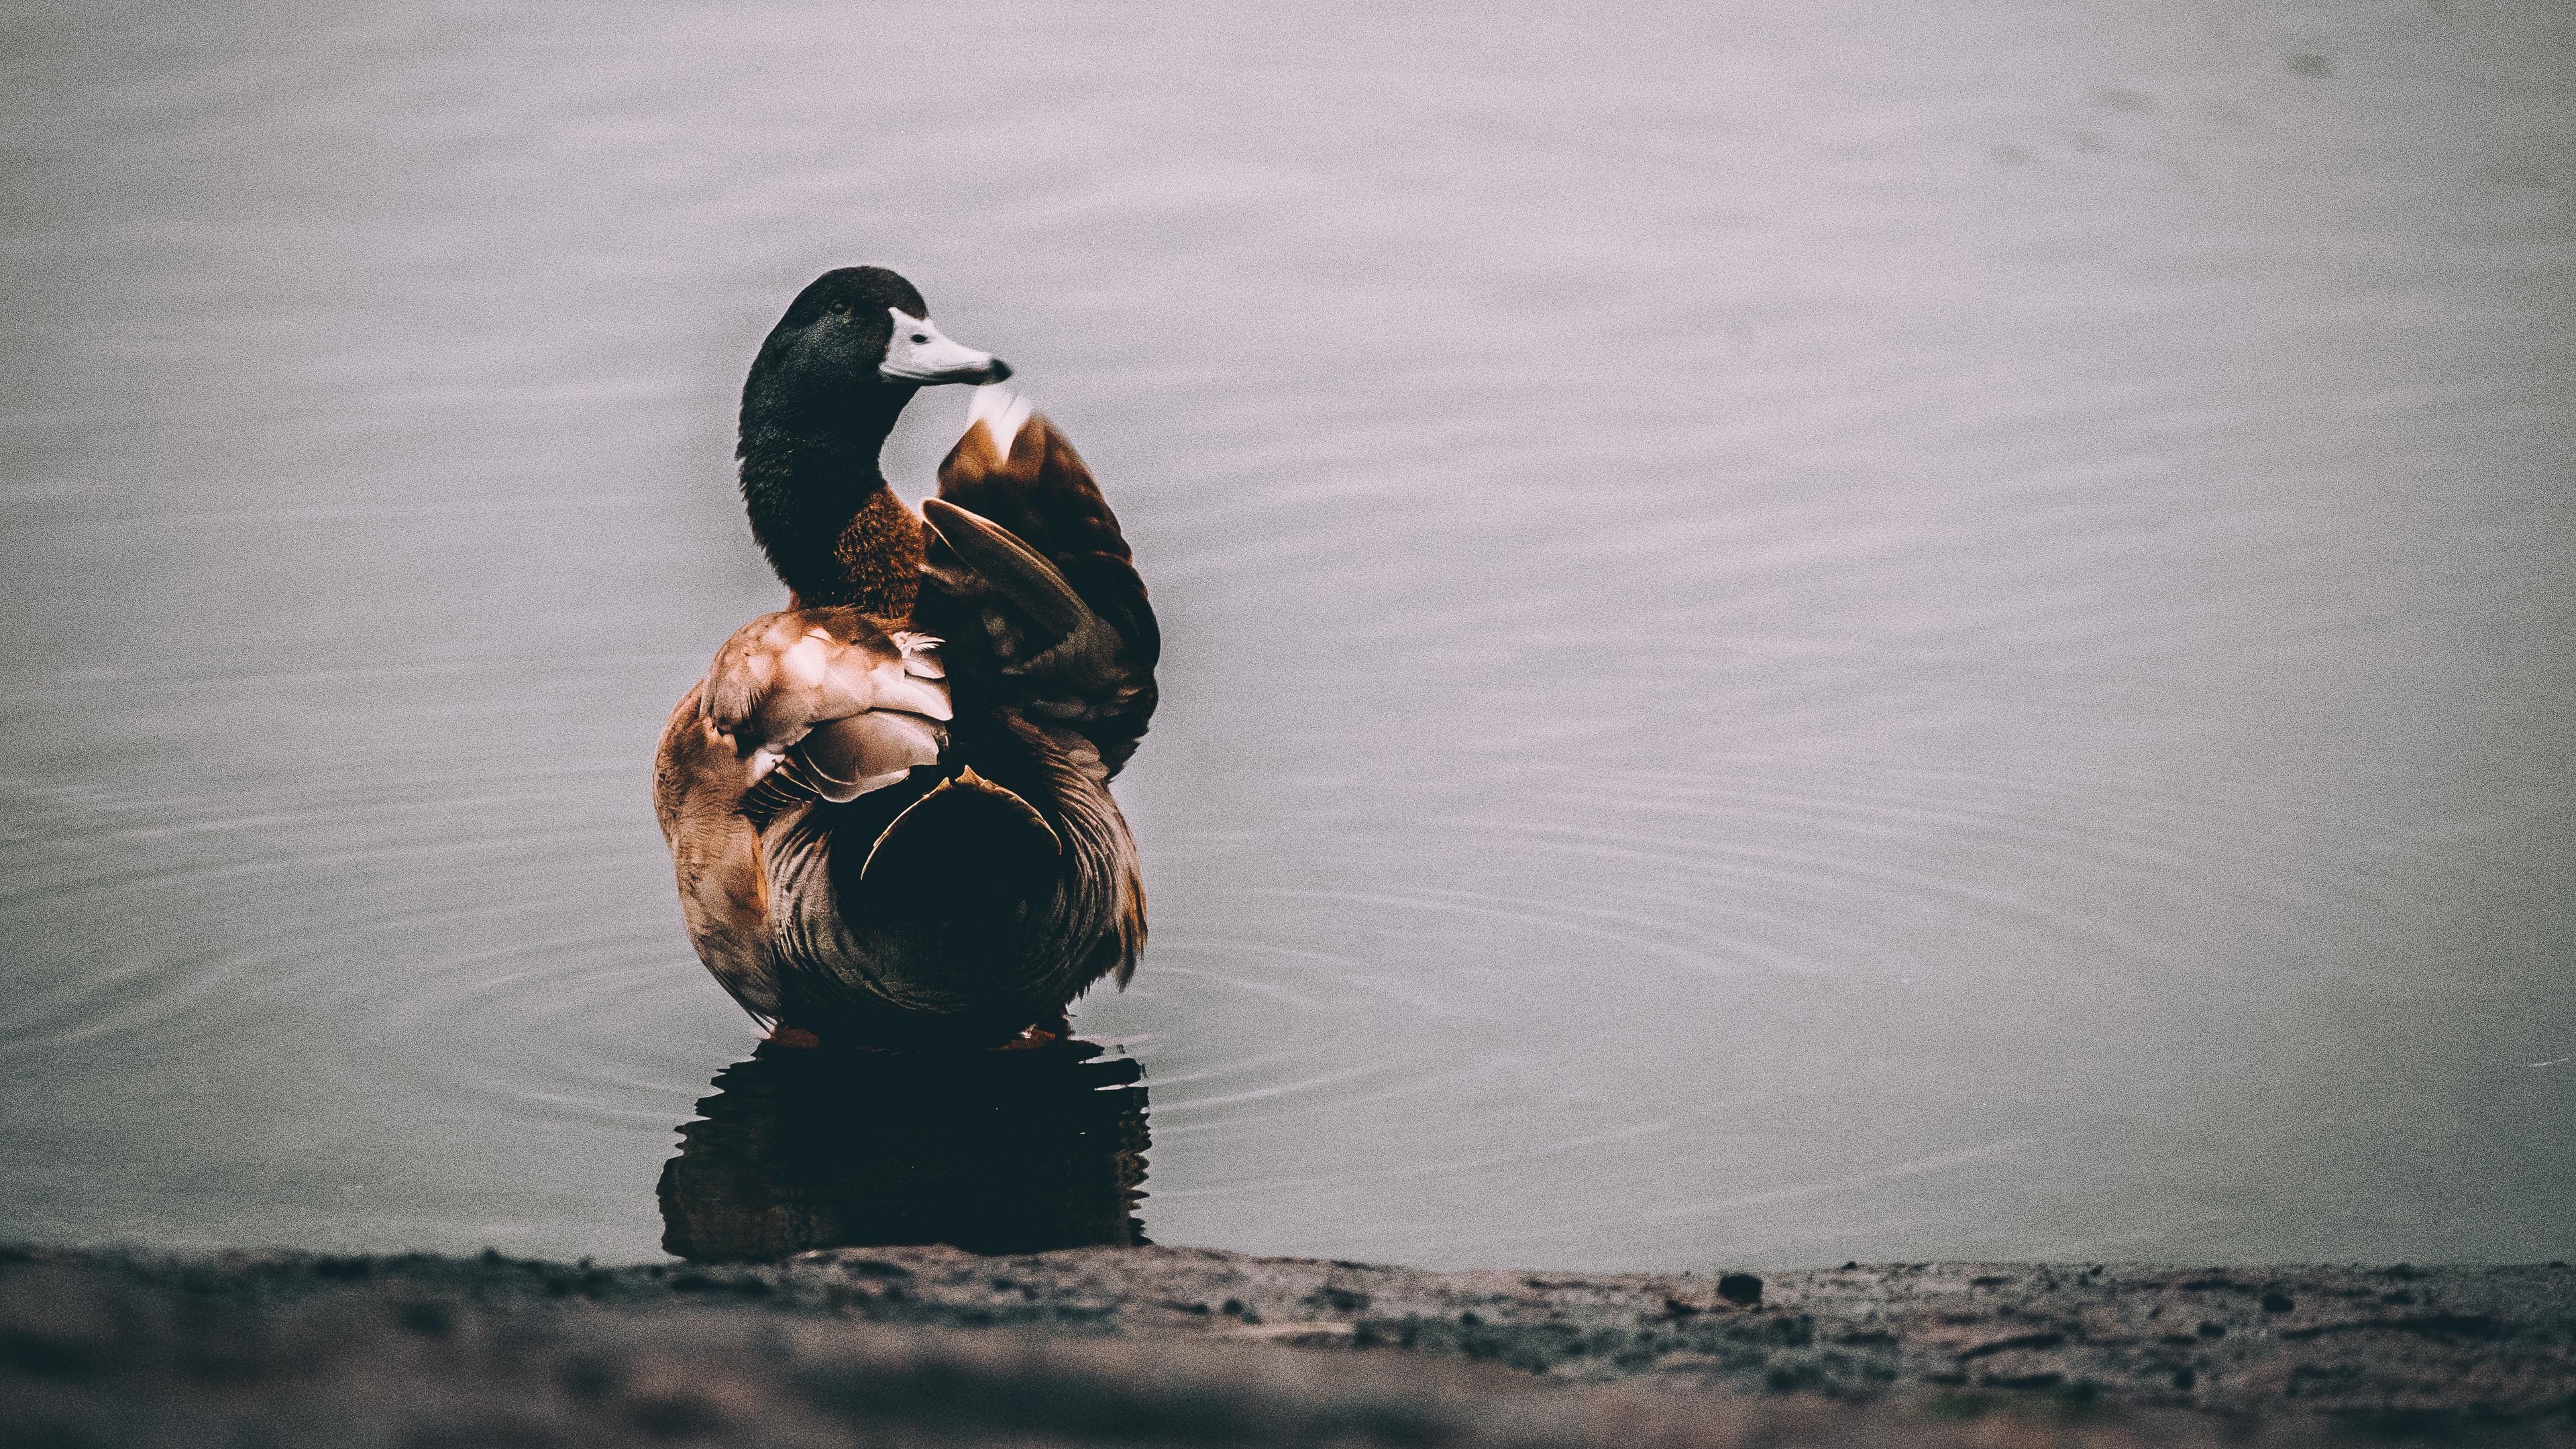 duck lake bird 4k 1542243029 - duck, lake, bird 4k - Lake, duck, Bird